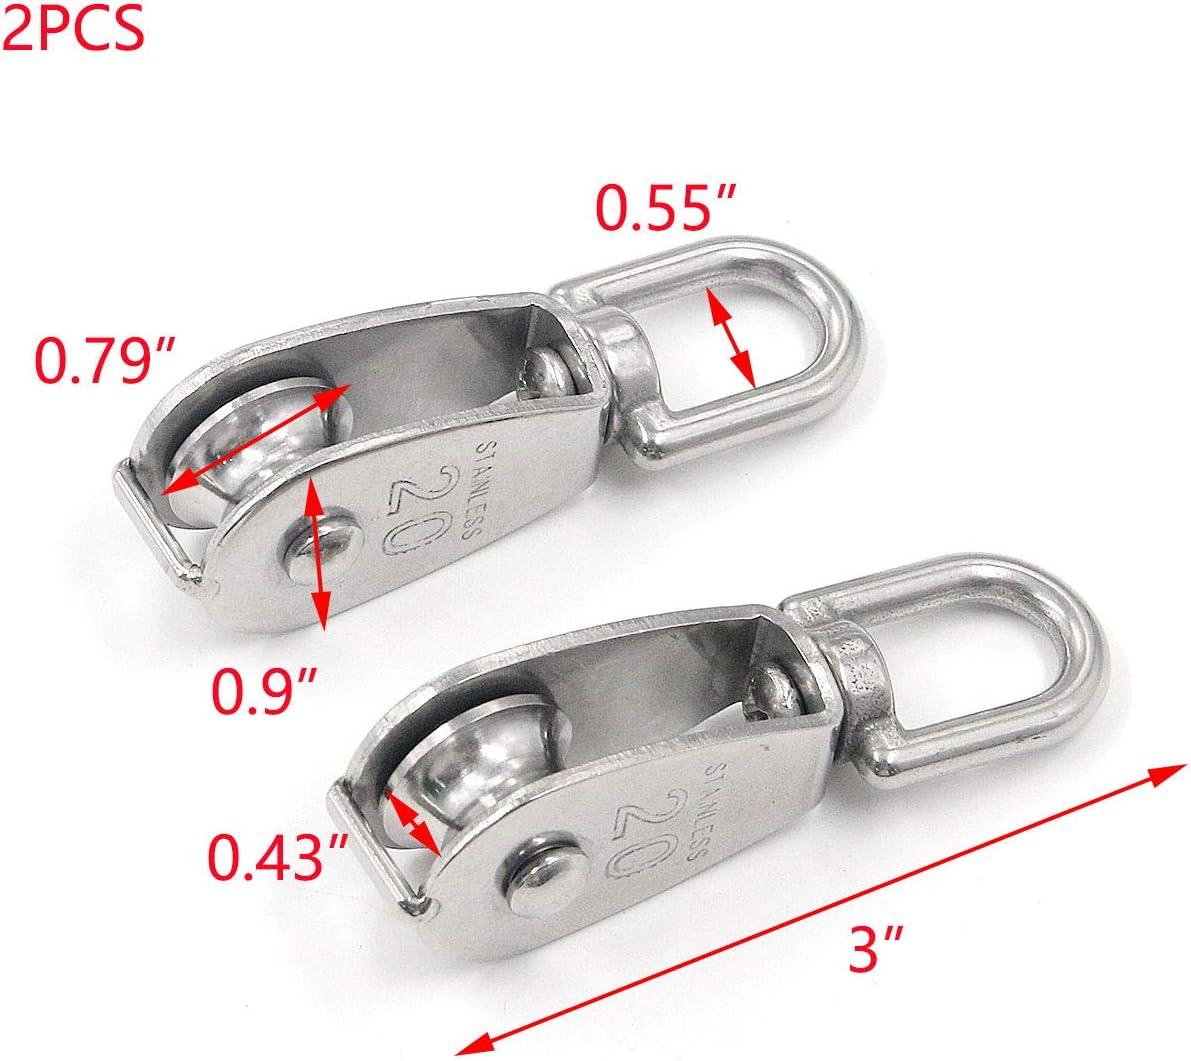 Tulead Lifting Single Pulley Stainless Steel Pulley Rope Swivel Wheel Block M15 Dia,Pack of 5